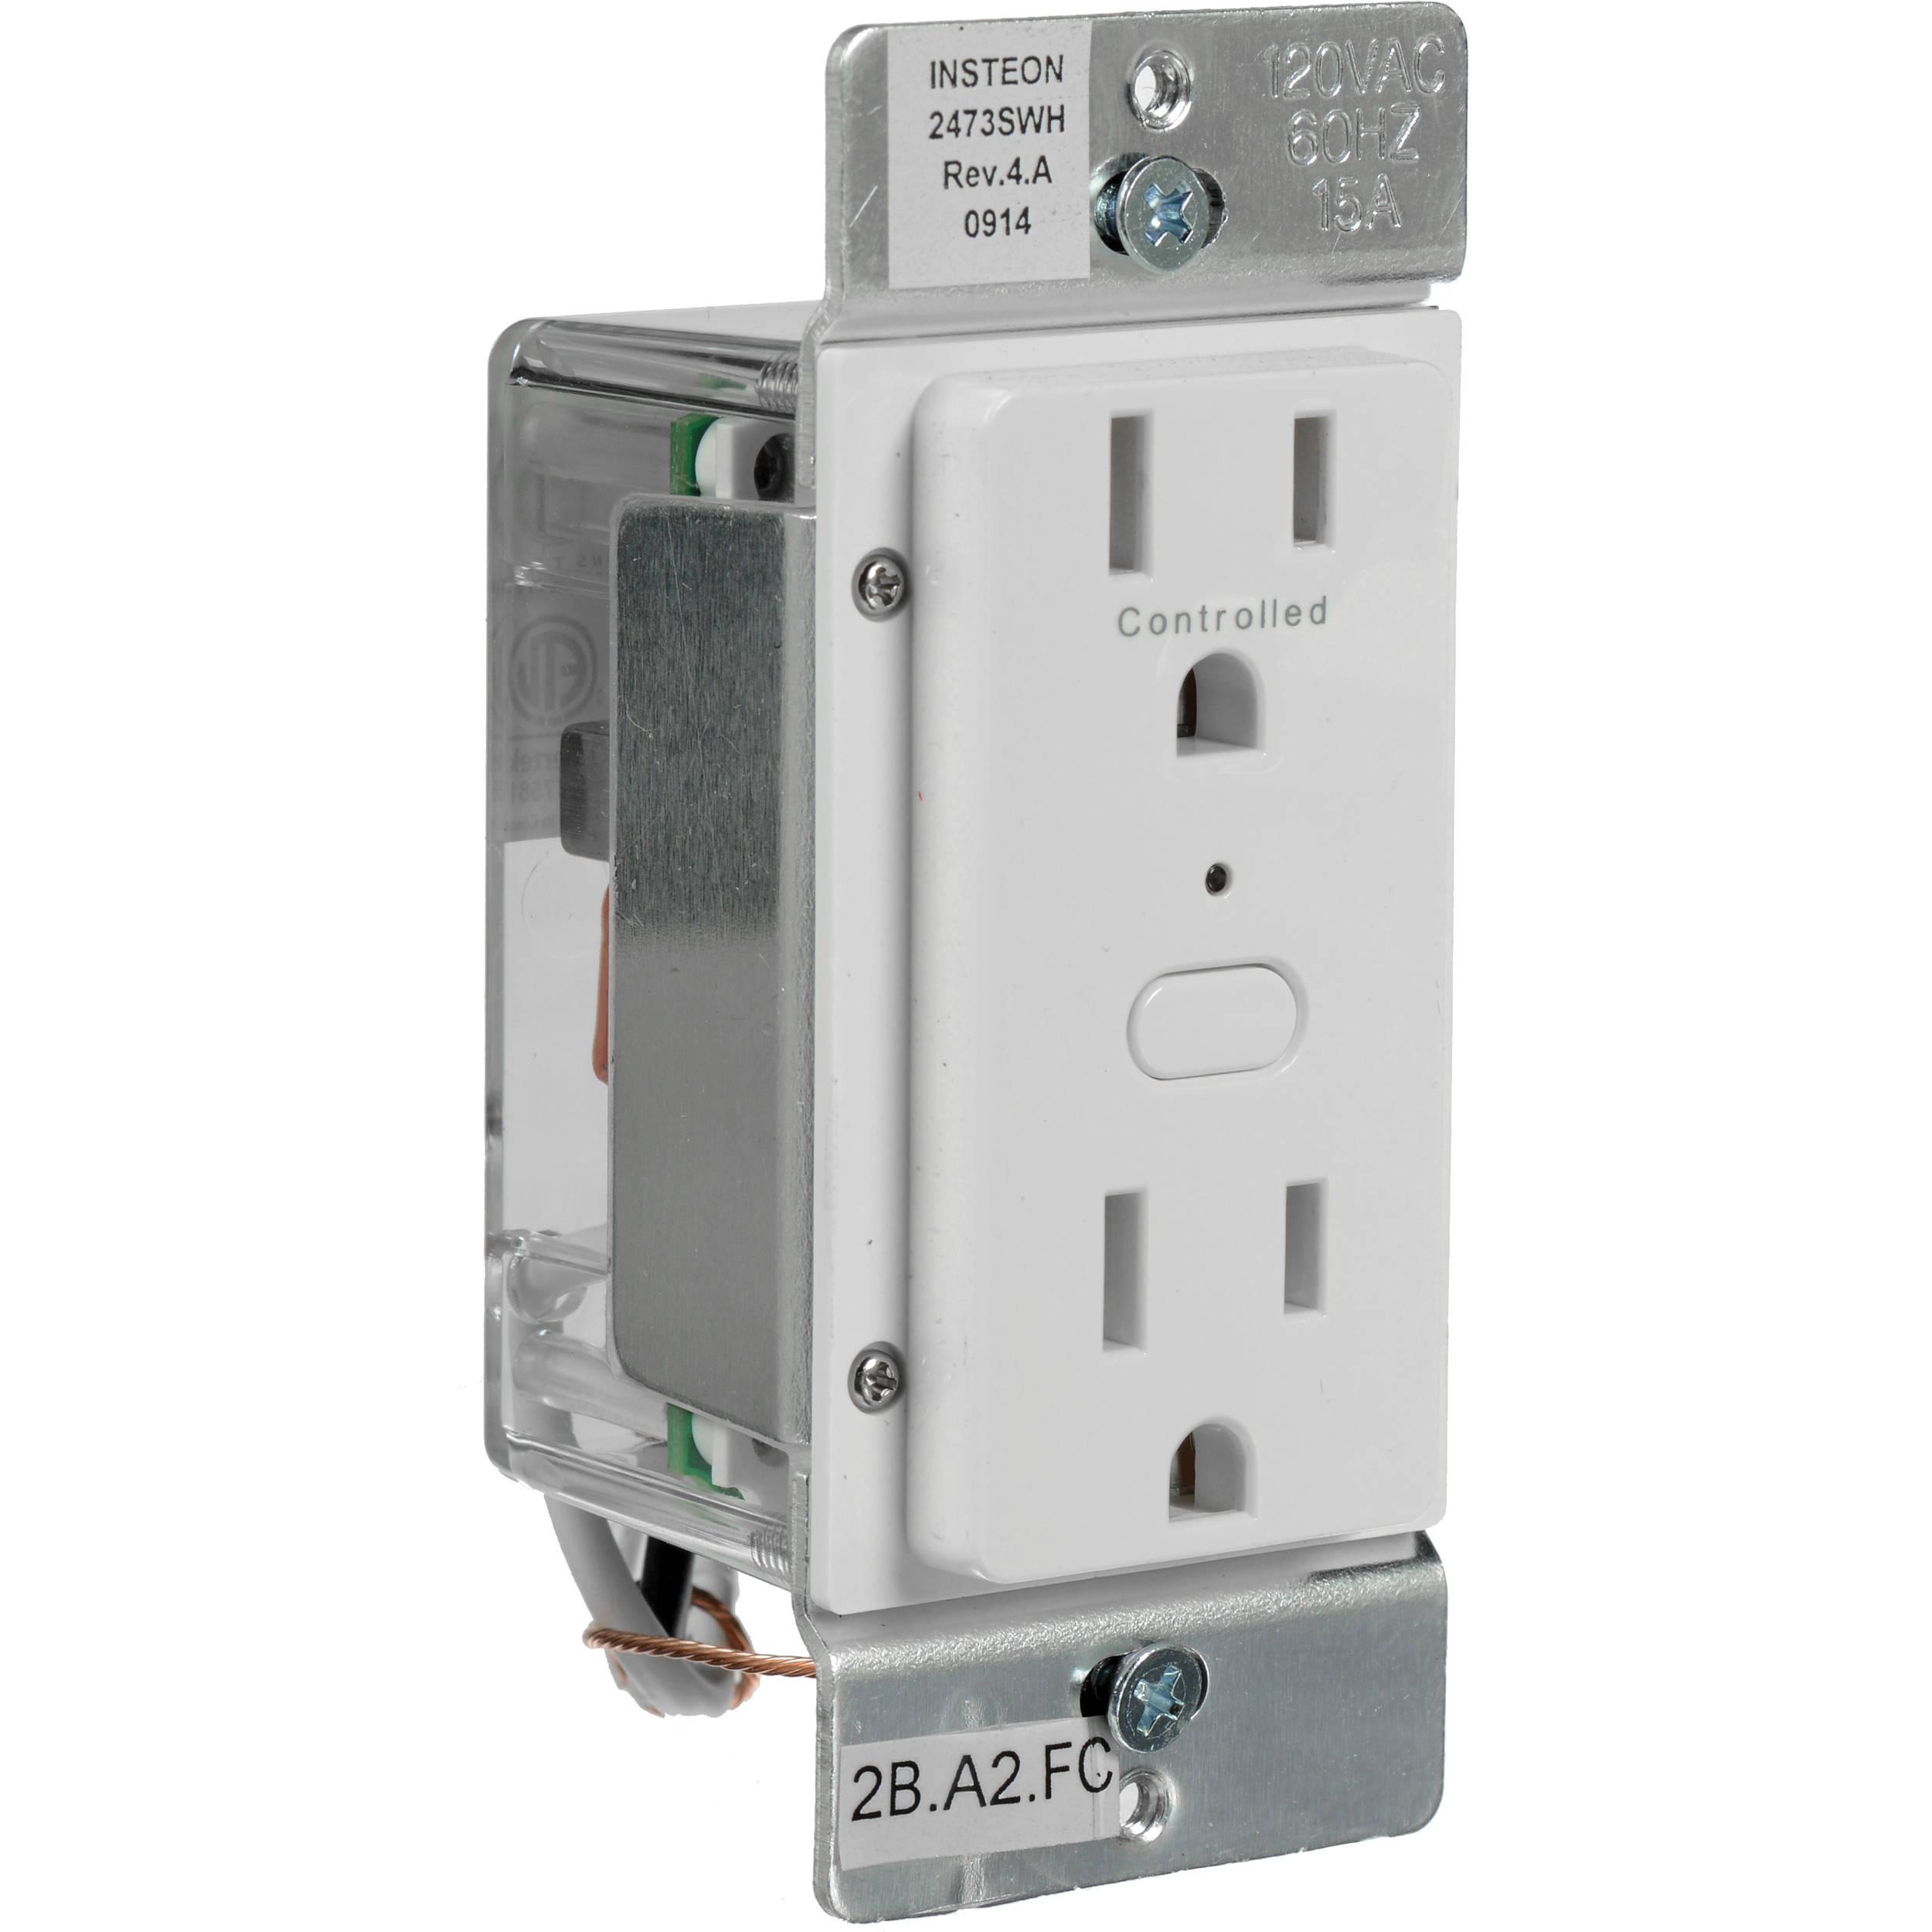 Insteon Outletlinc Remote Control Outlet 2663